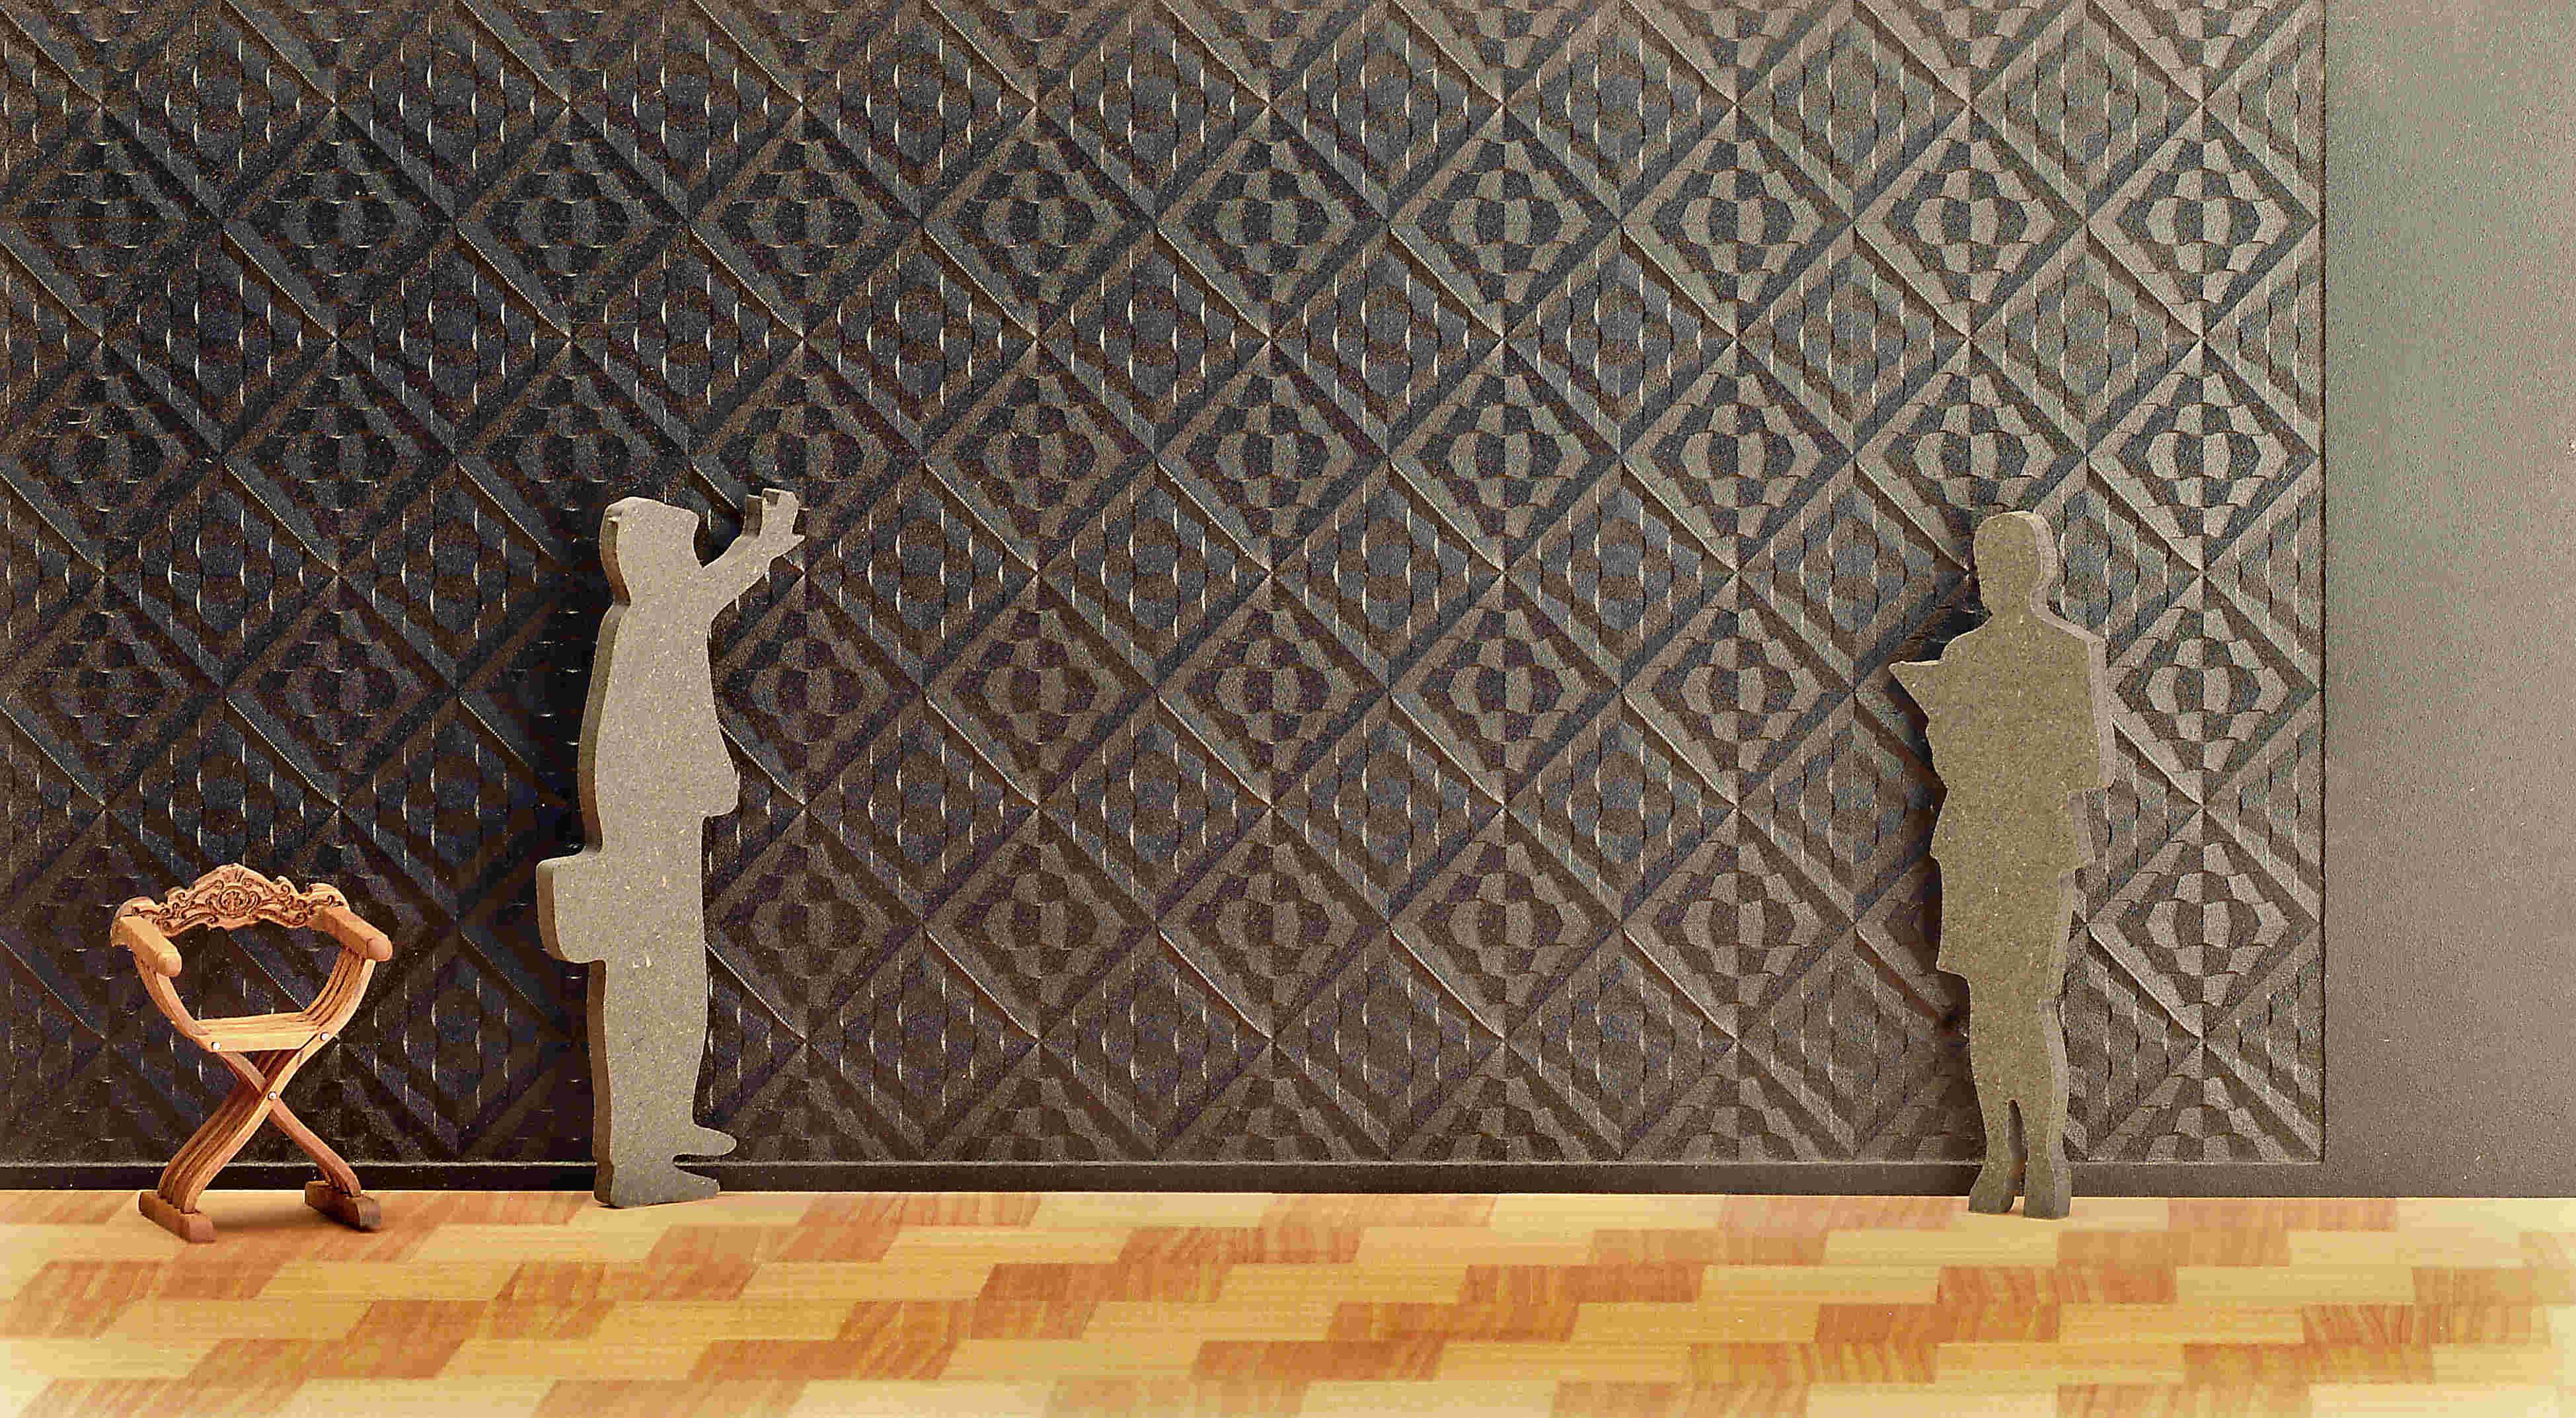 pannelli tridimensionali mdf